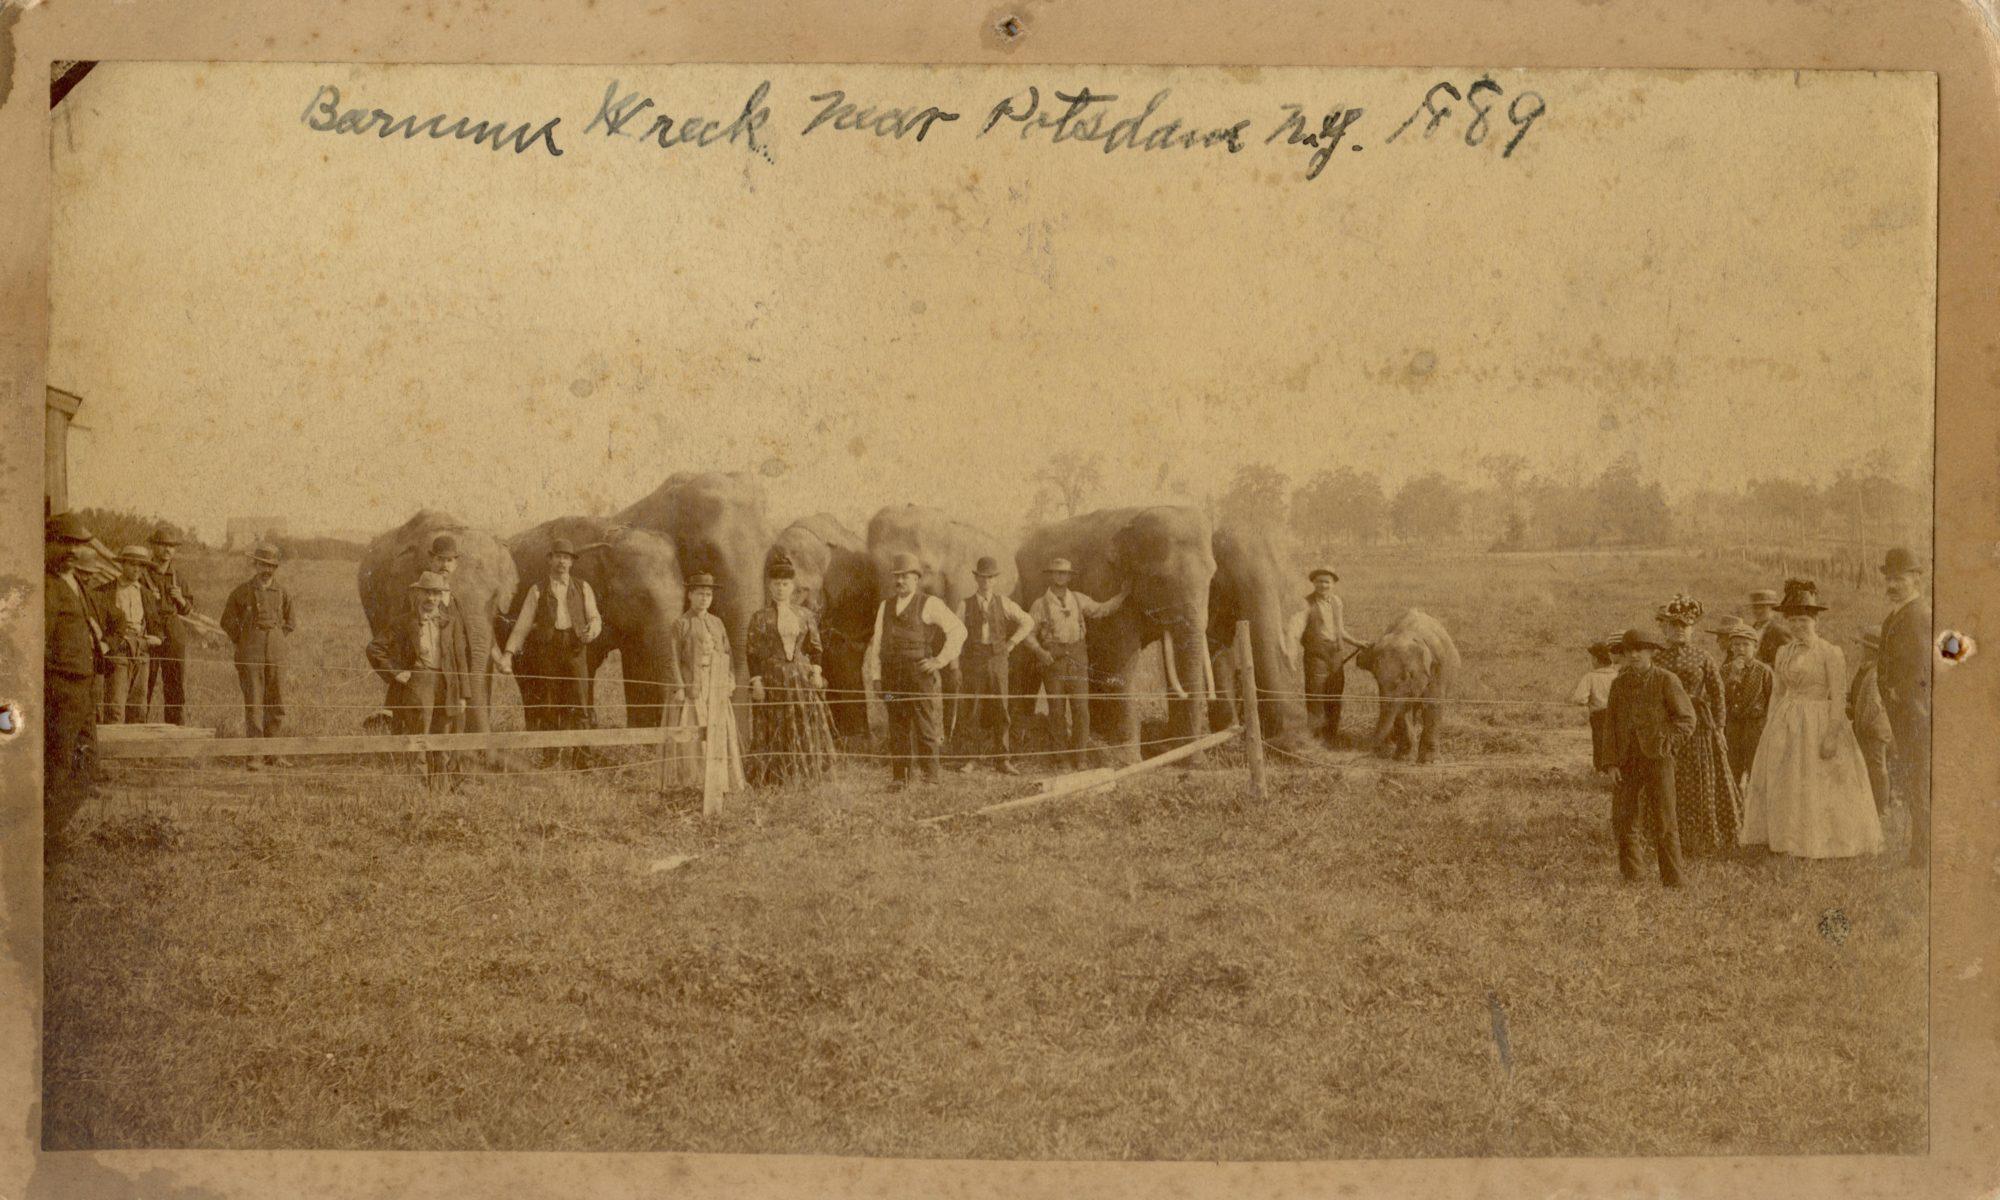 Nineteenth century people standing near elephants